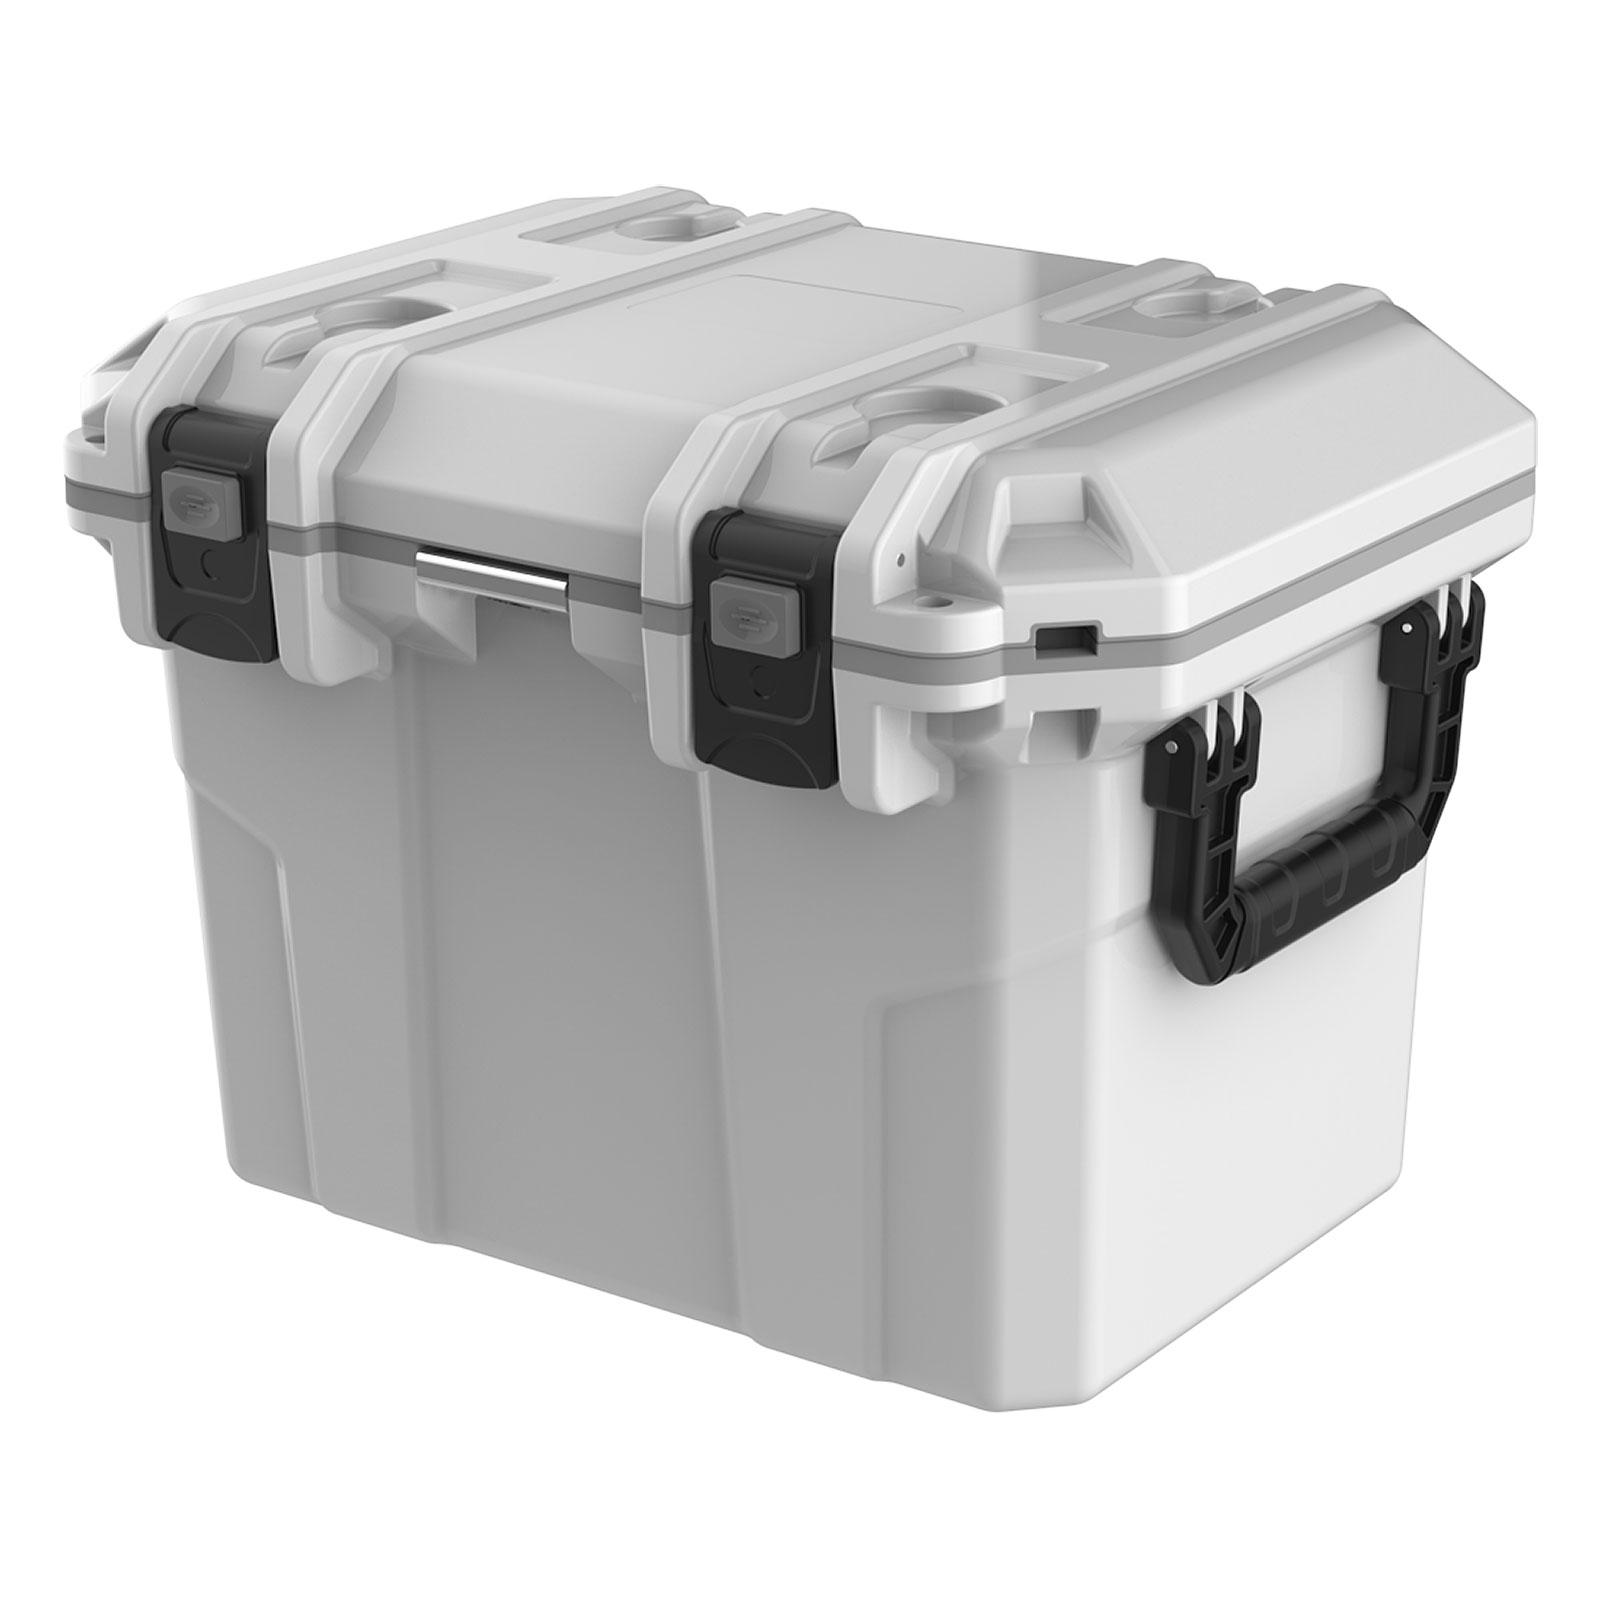 Tsunami Kühlbox 50 Quart Cooler Box 50 Liter 50 l - Weiß COB50 WHITE